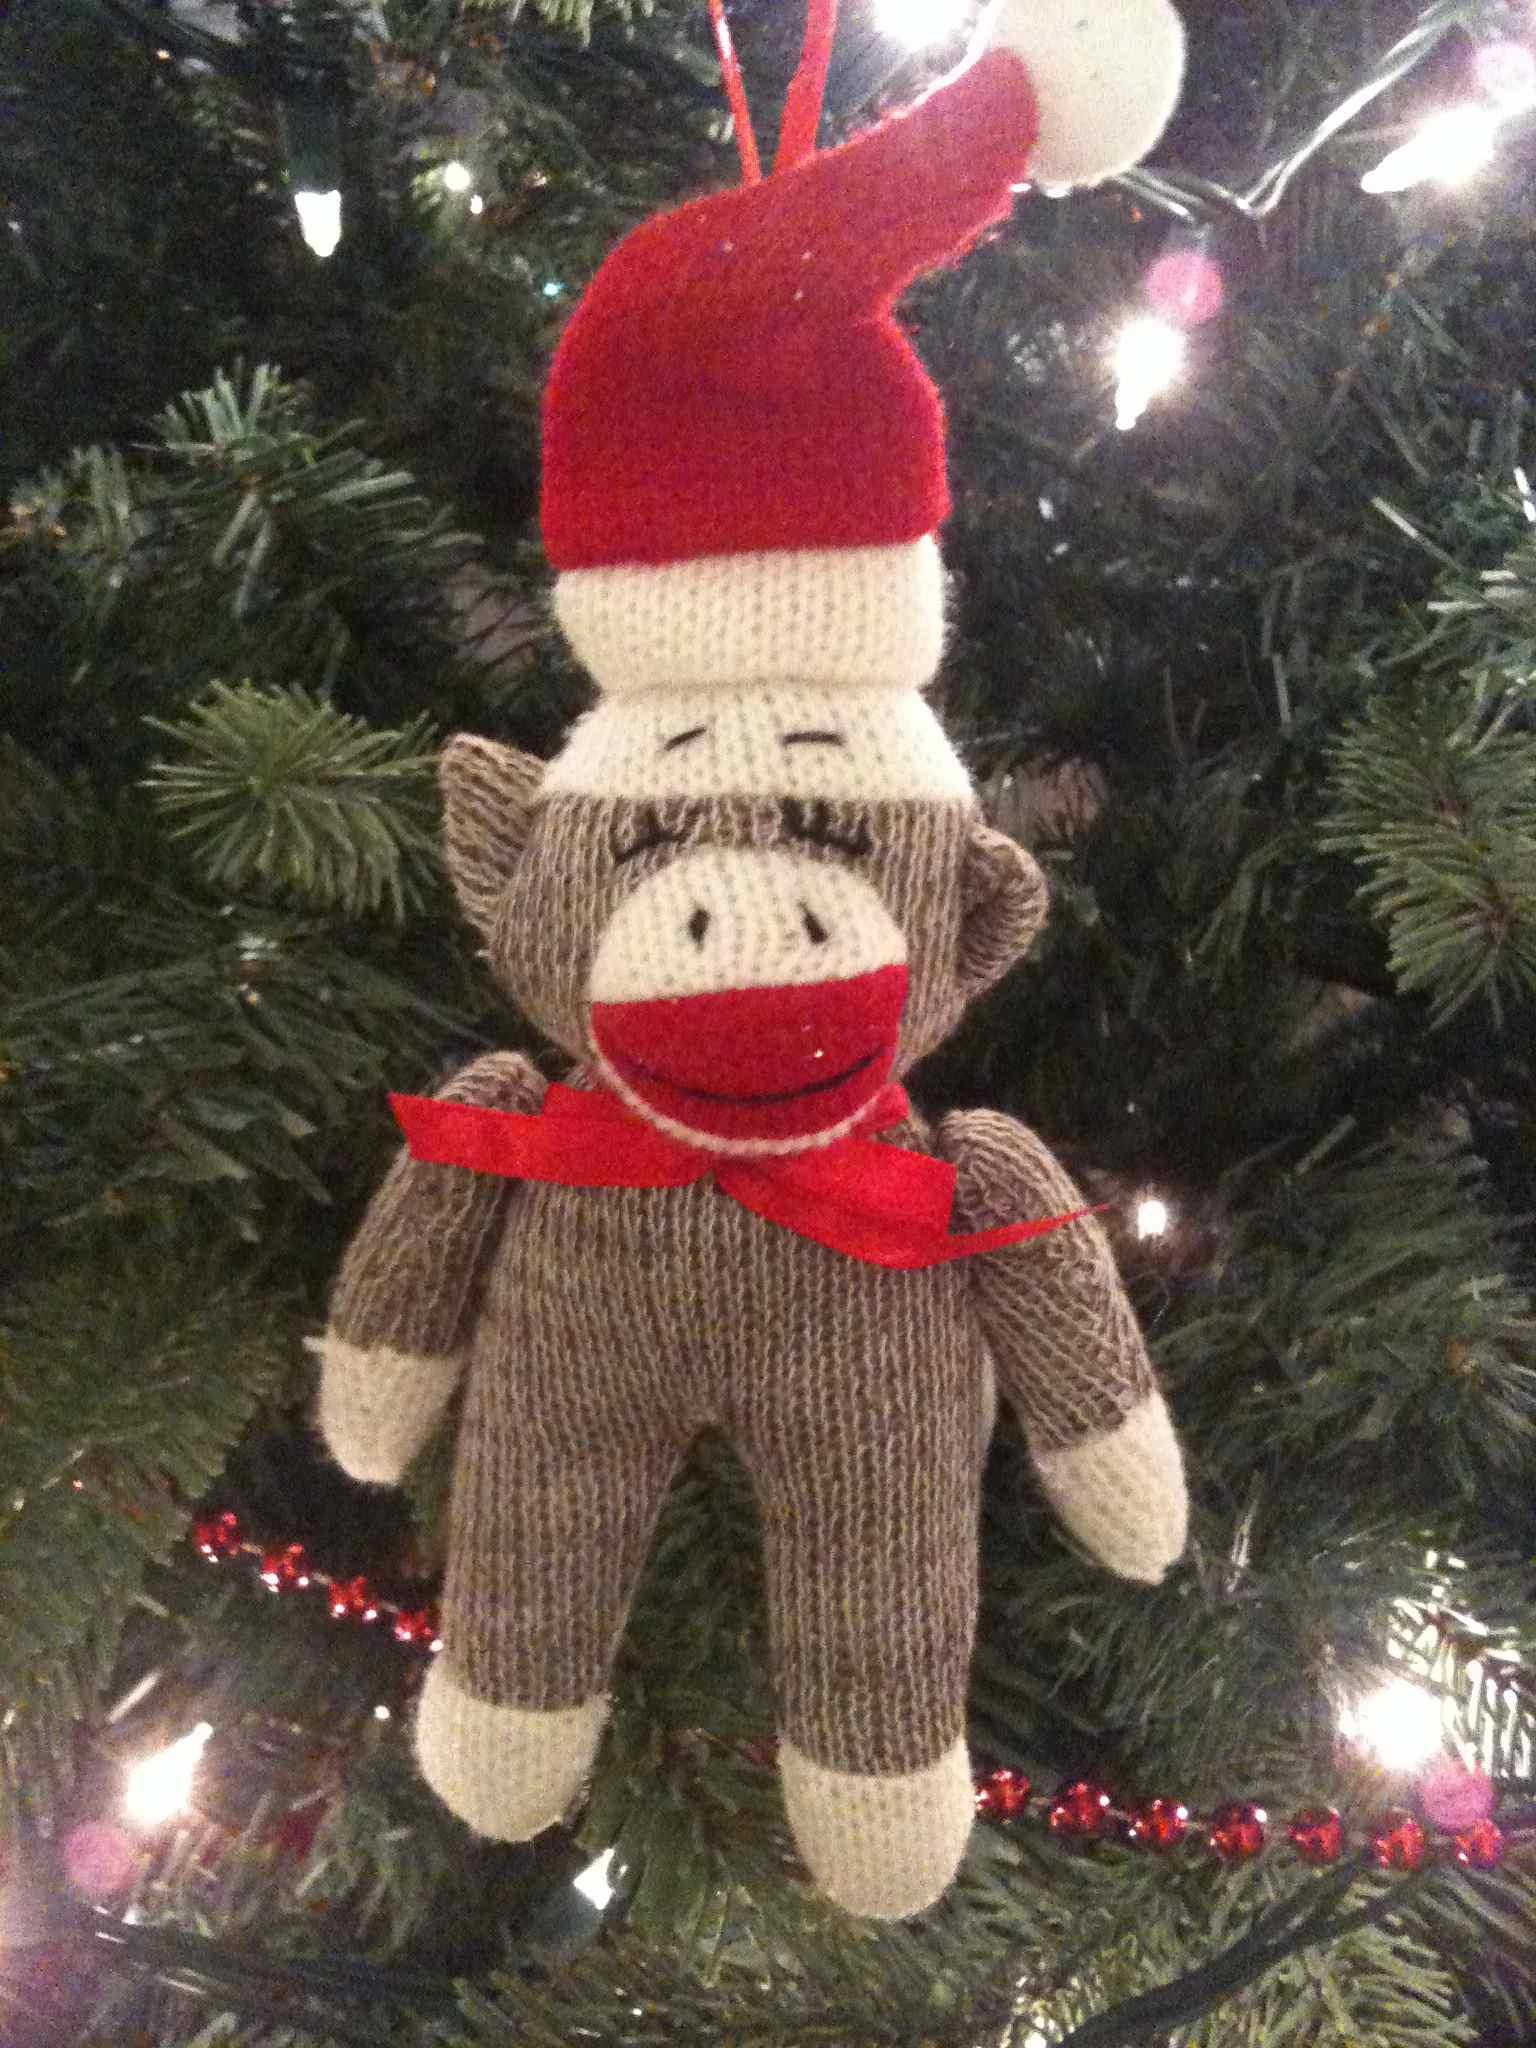 My Beloved Christmas Sock Monkey Ornament